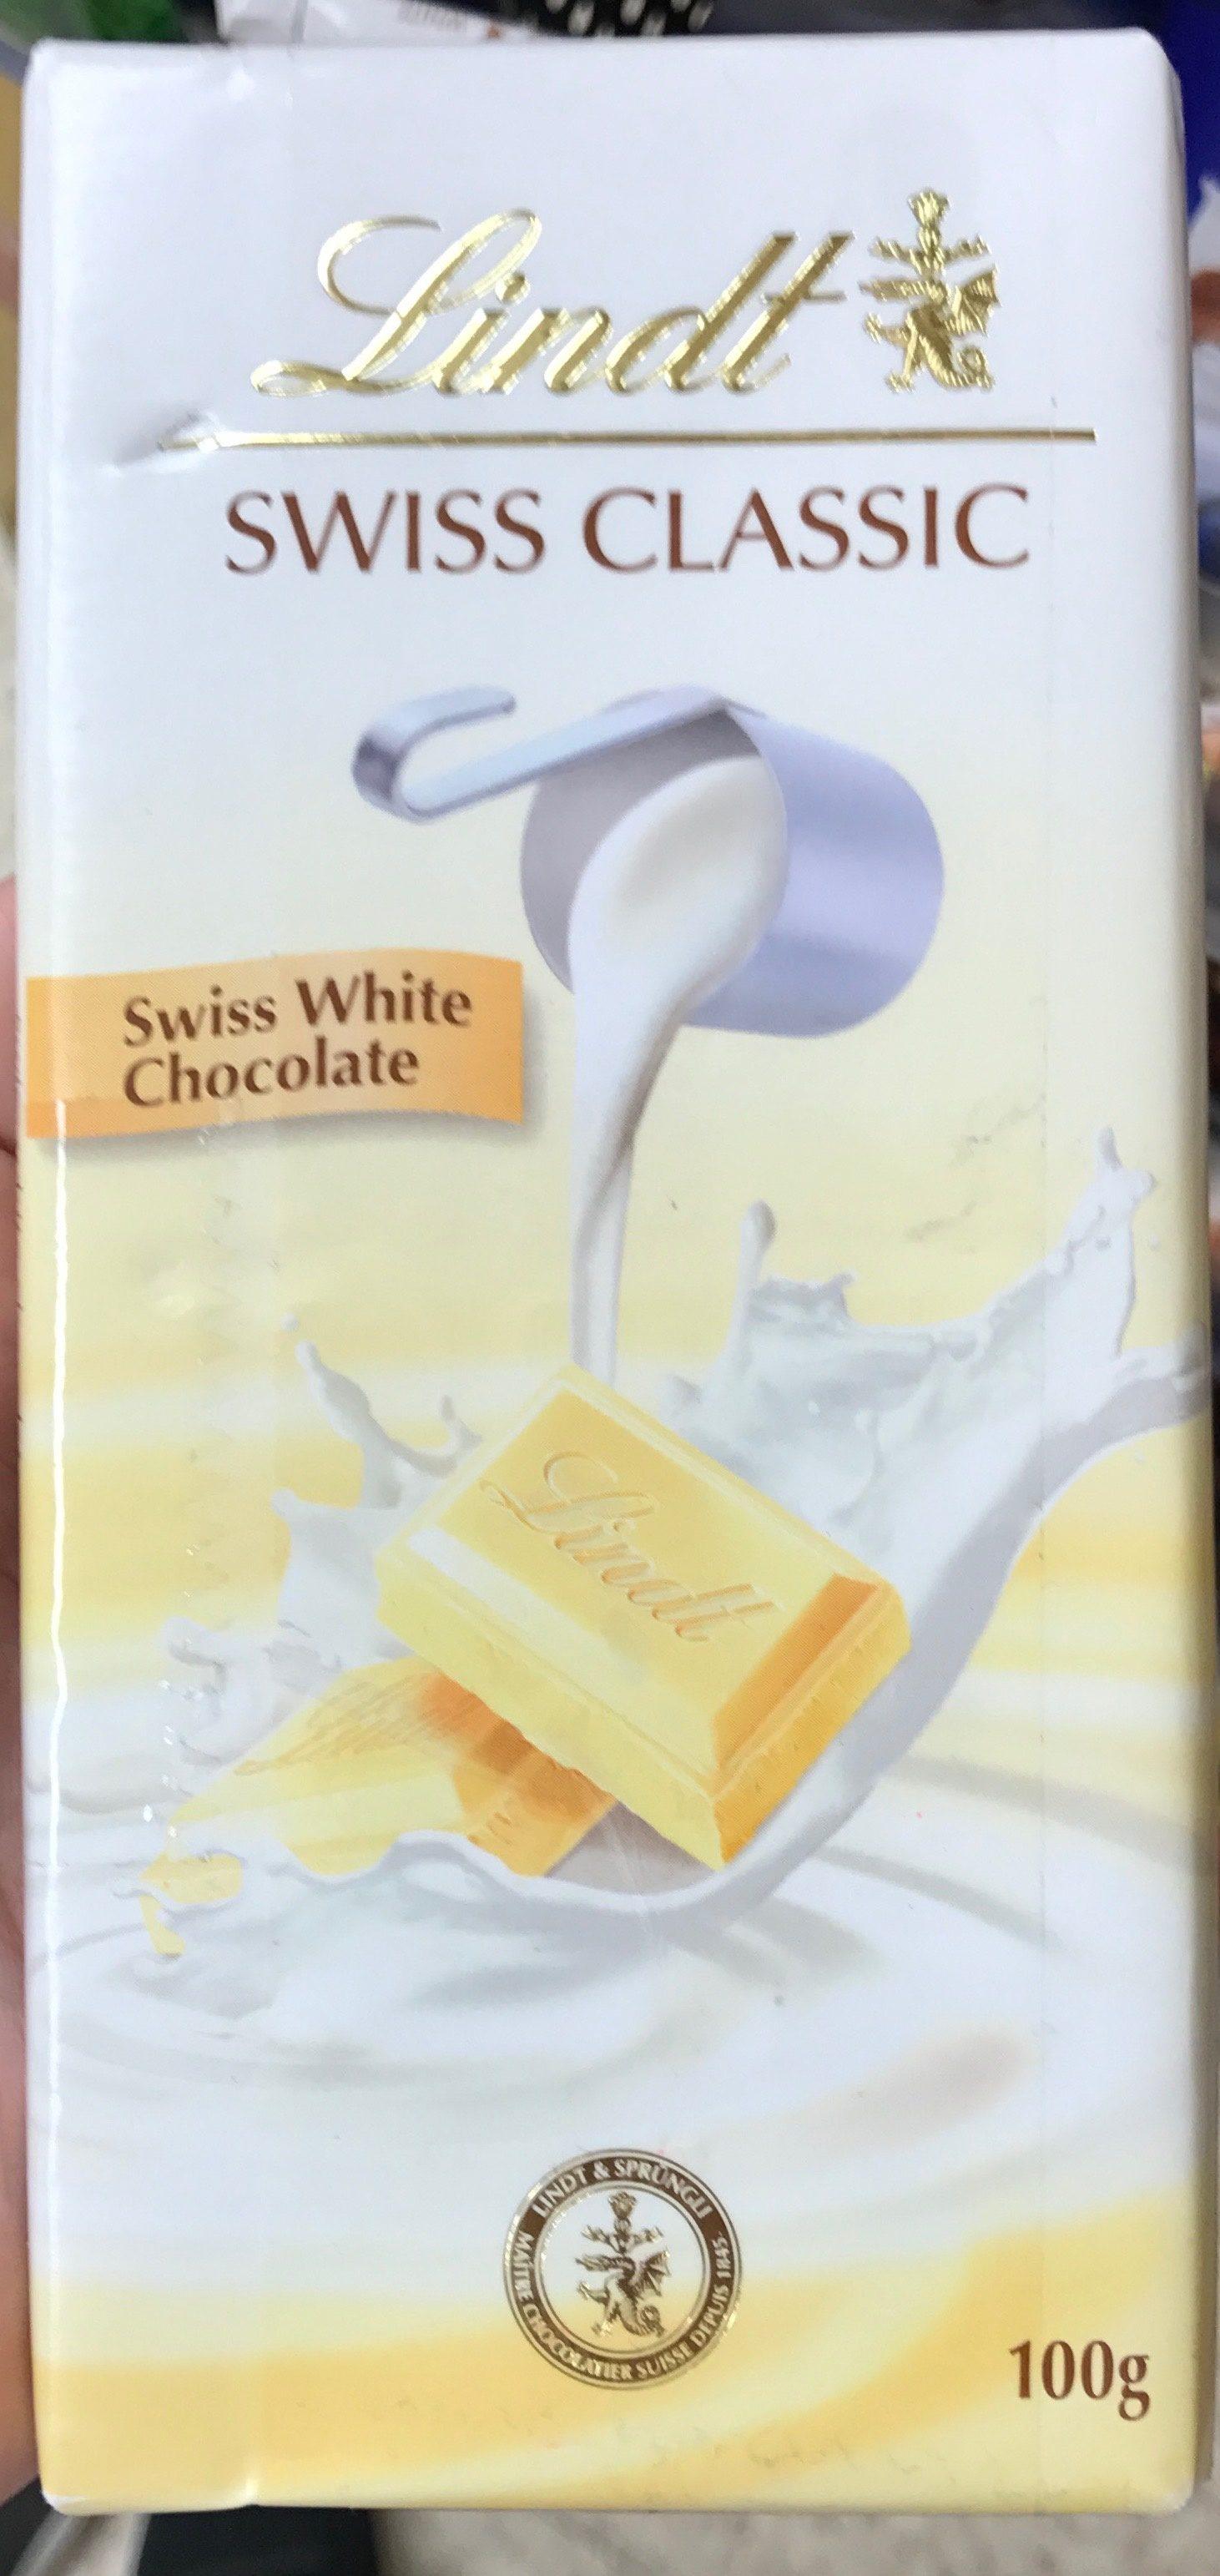 Swiss Classic White Chocolate - Lindt - 100 G - 产品 - en